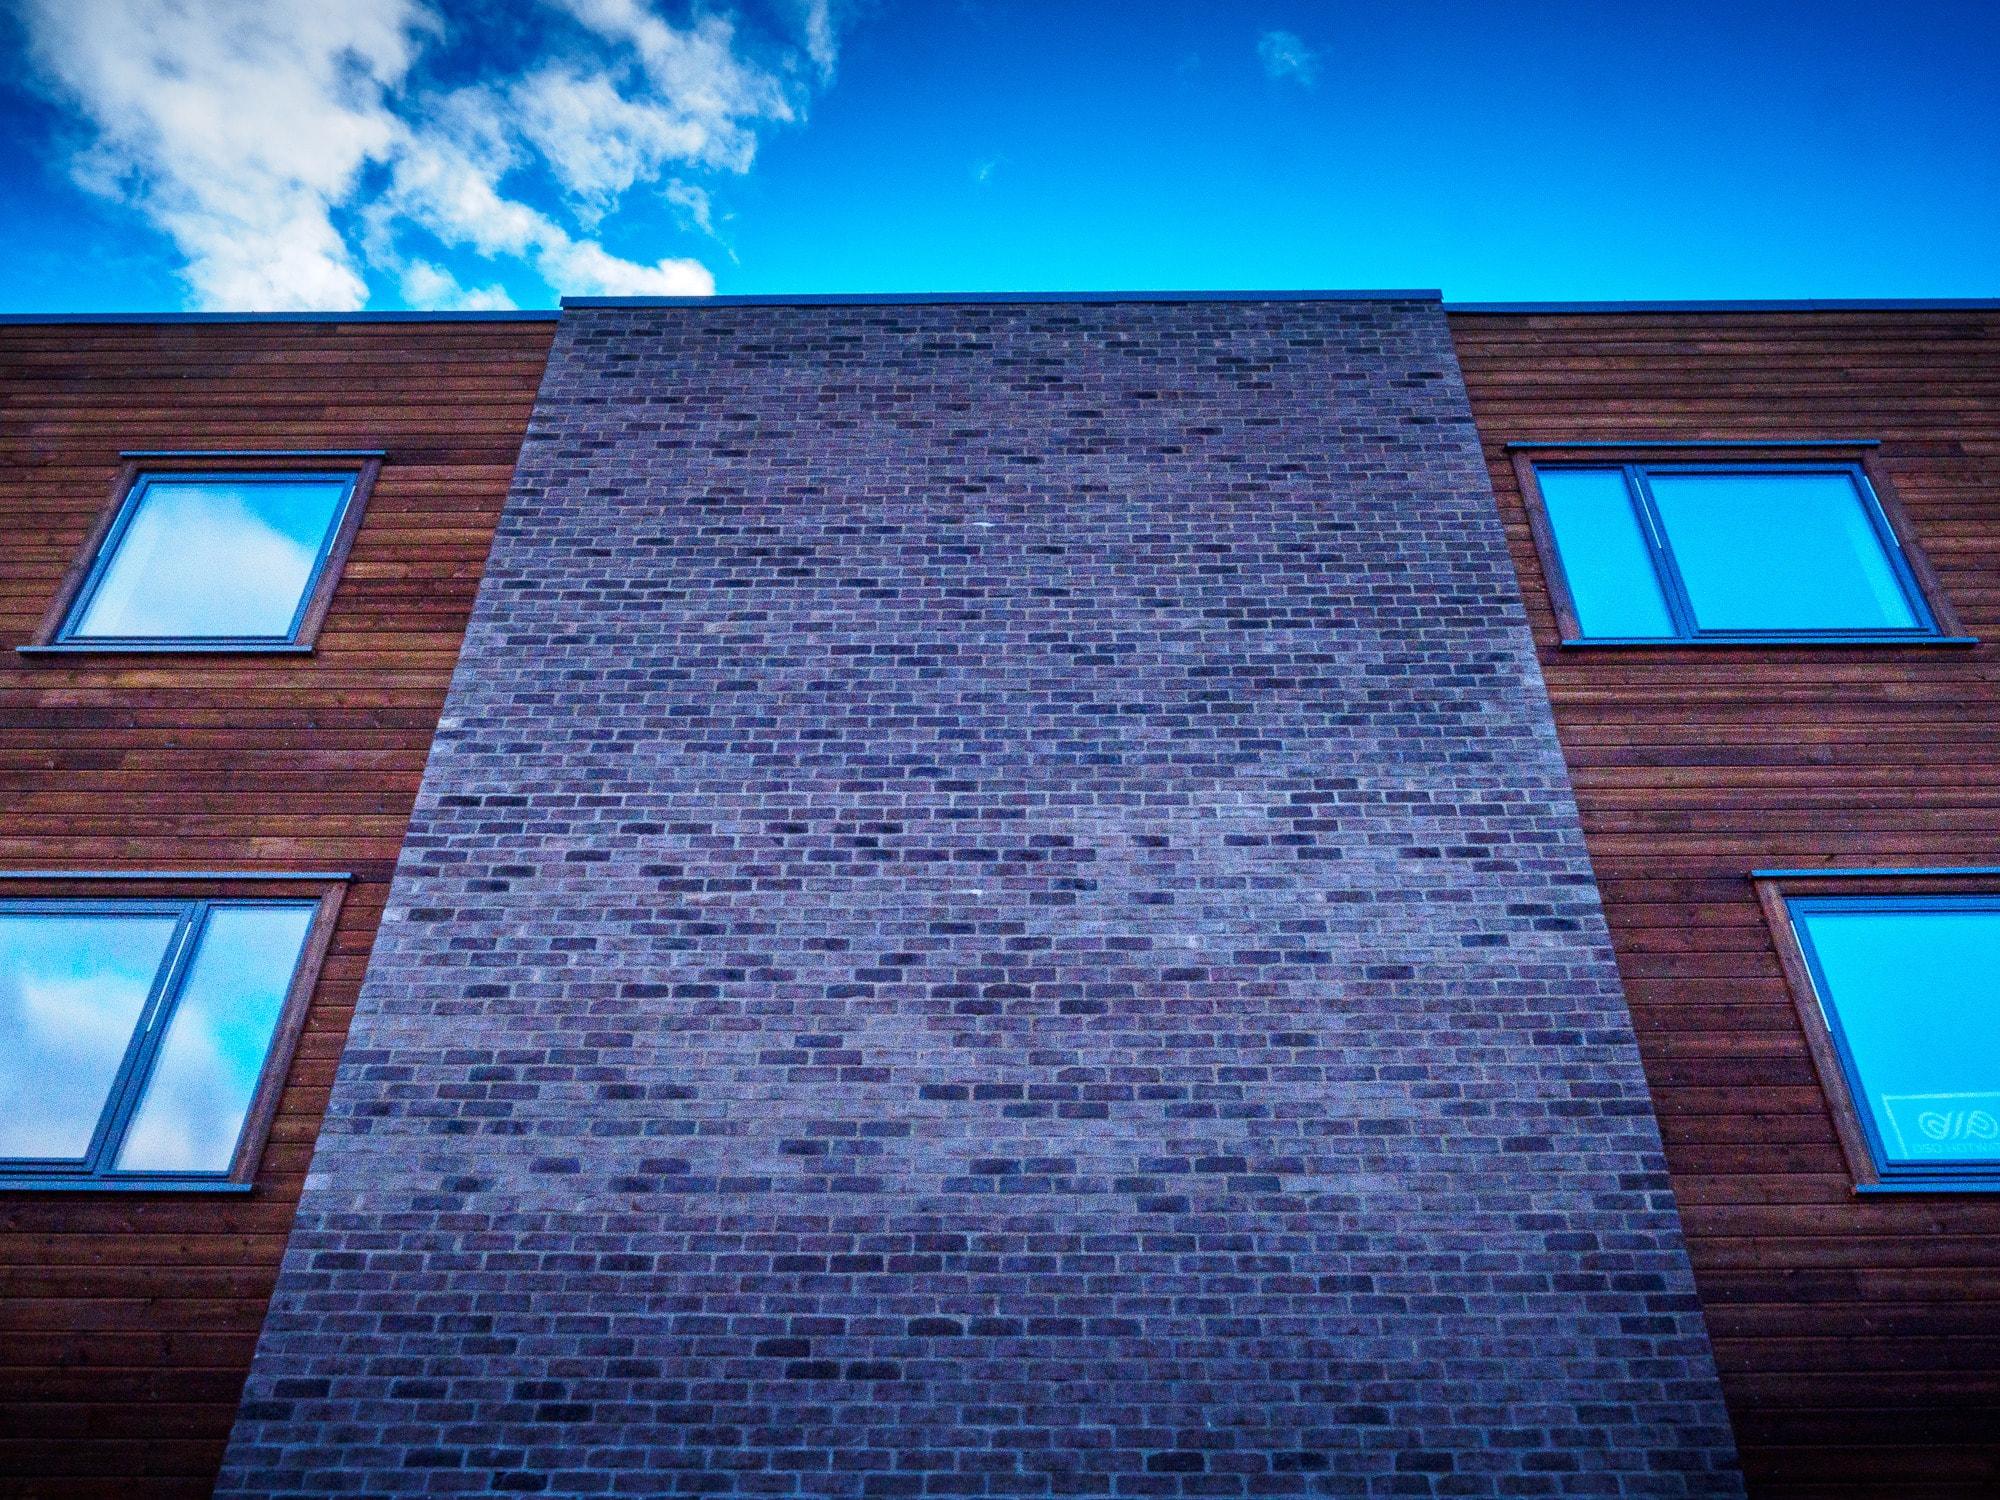 Line, Brickwork, Property, Light, Daytime, Wall, Architecture, Brick, Sky, Blue